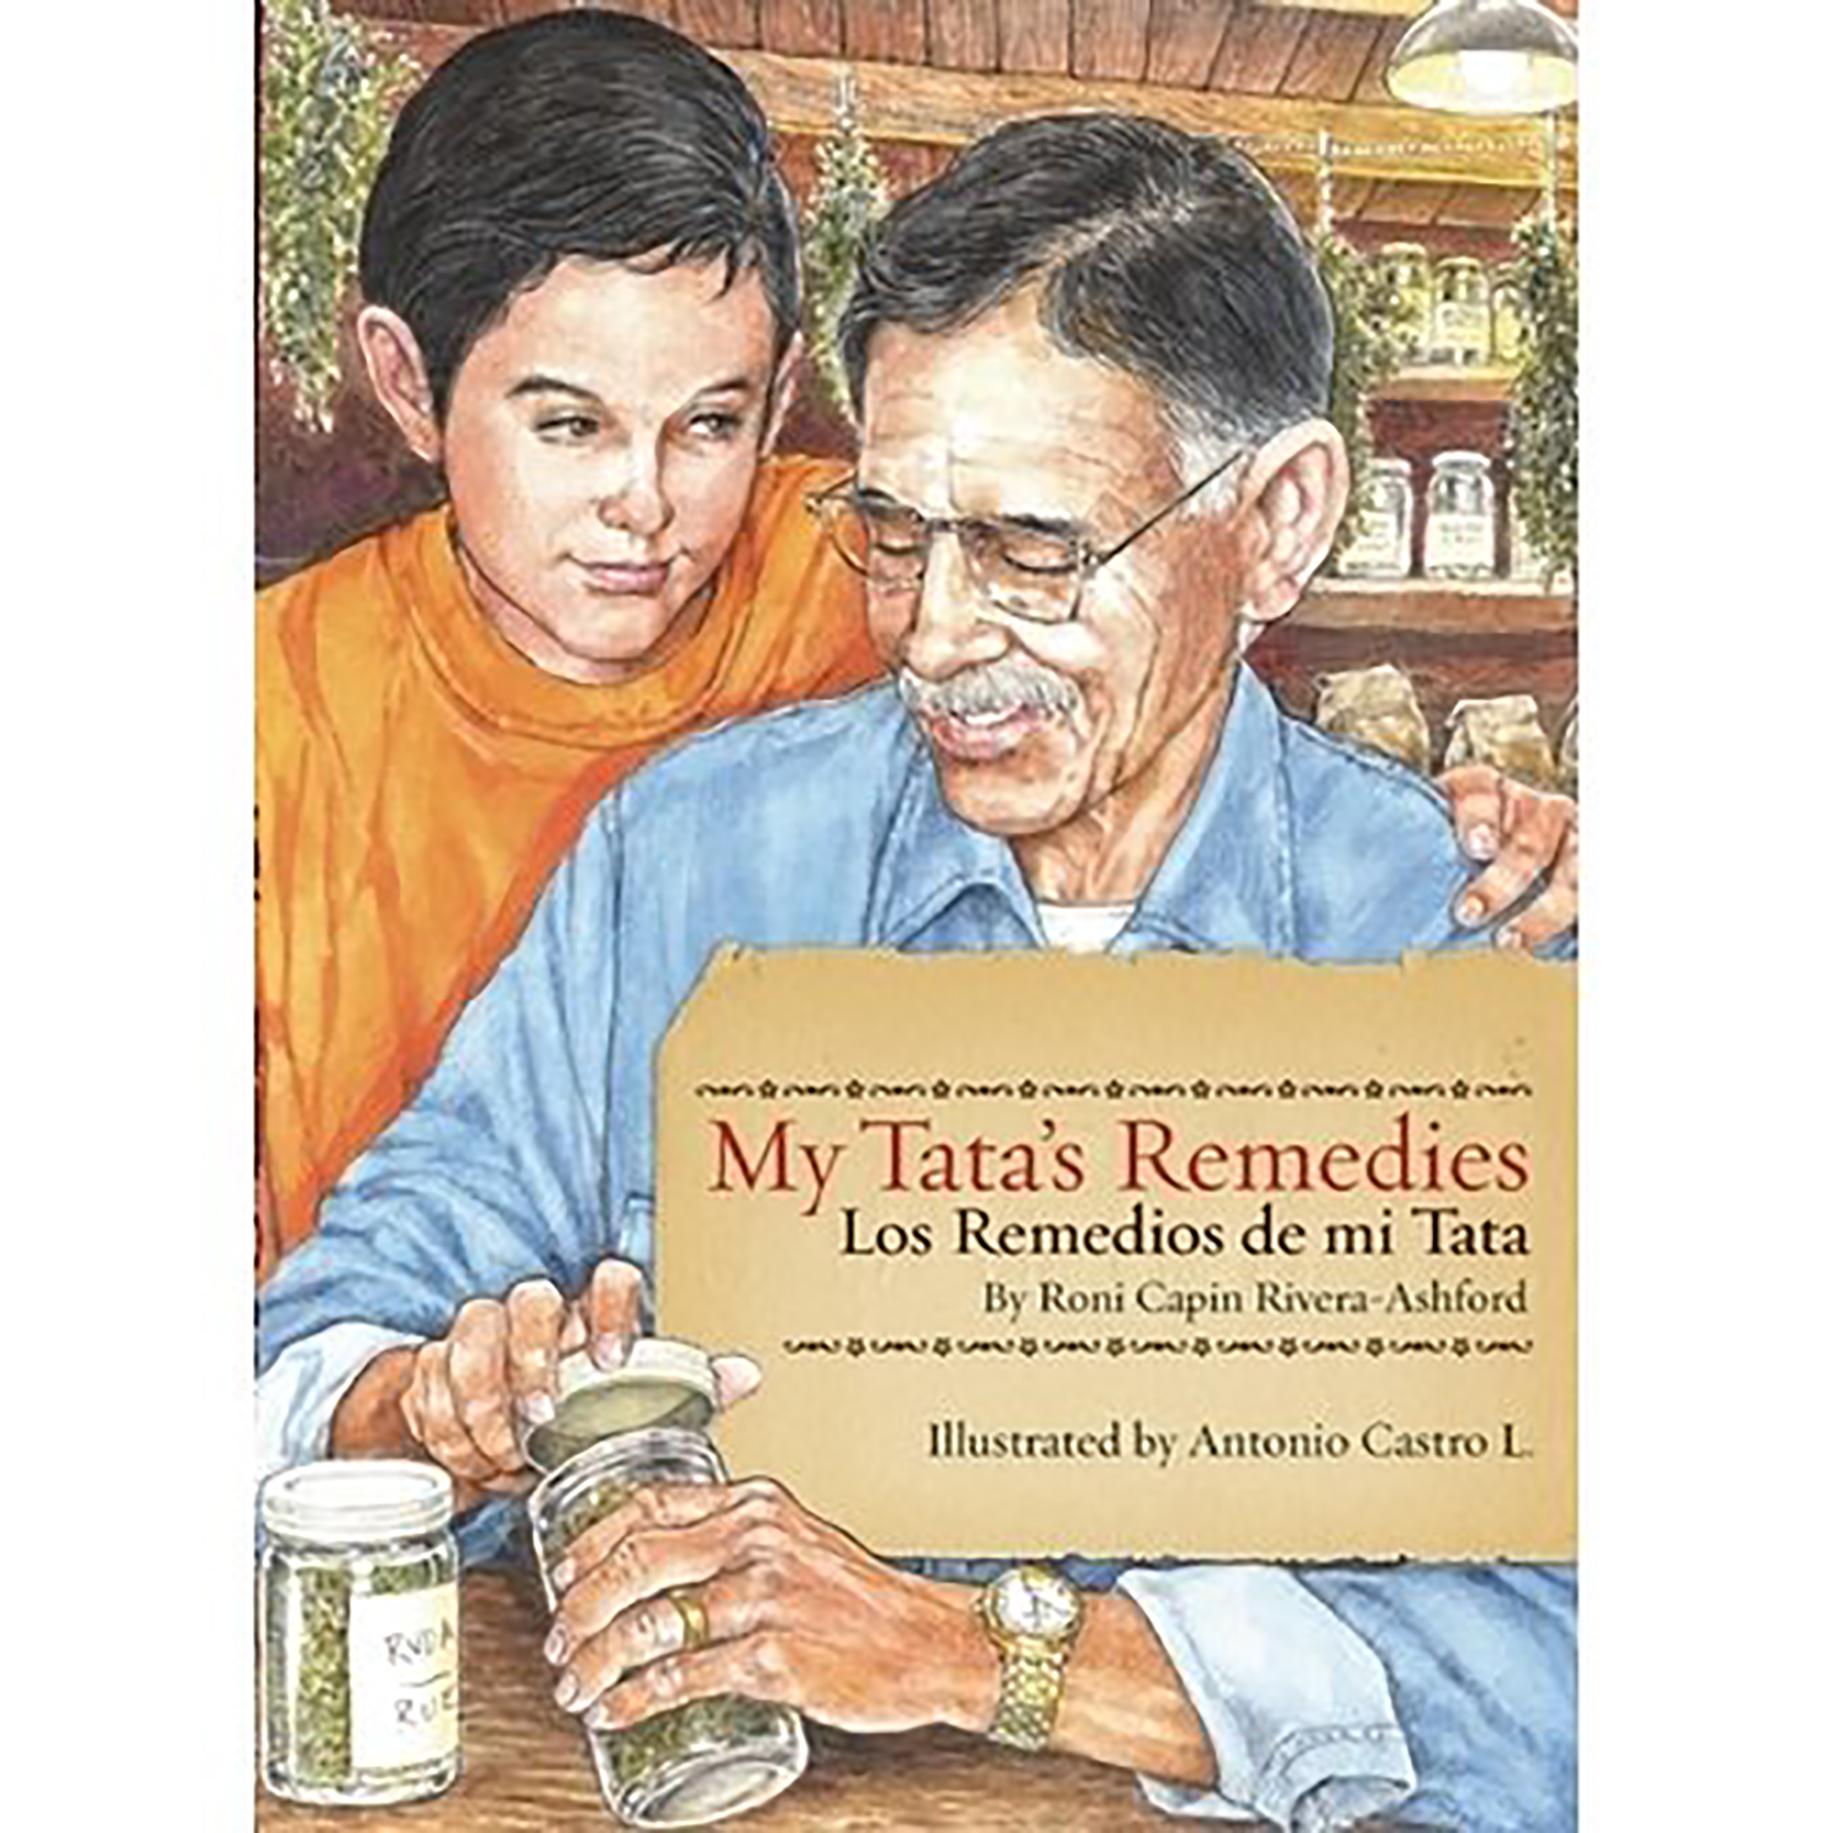 my tatas remedies the hispanic outlook-12 magazine